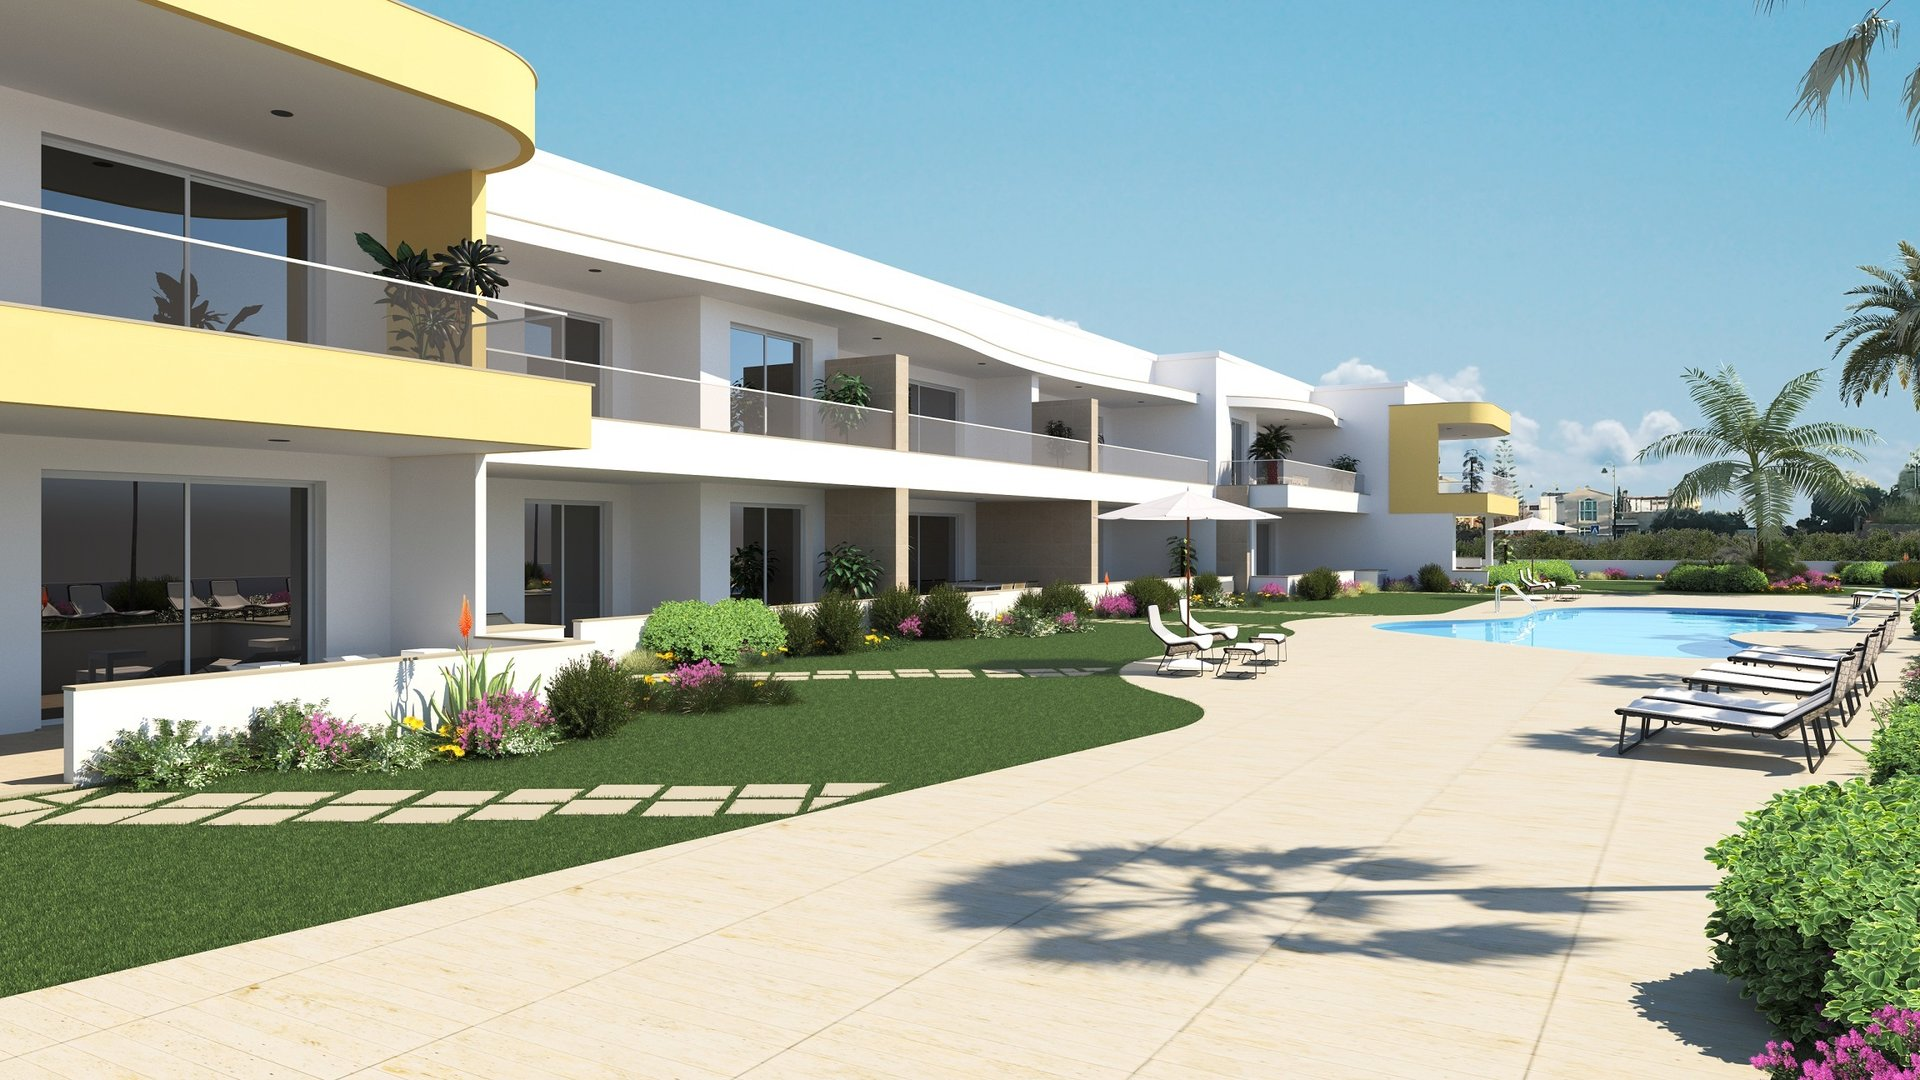 3 Bedroom Apartment Lagos, Western Algarve Ref: GA348B